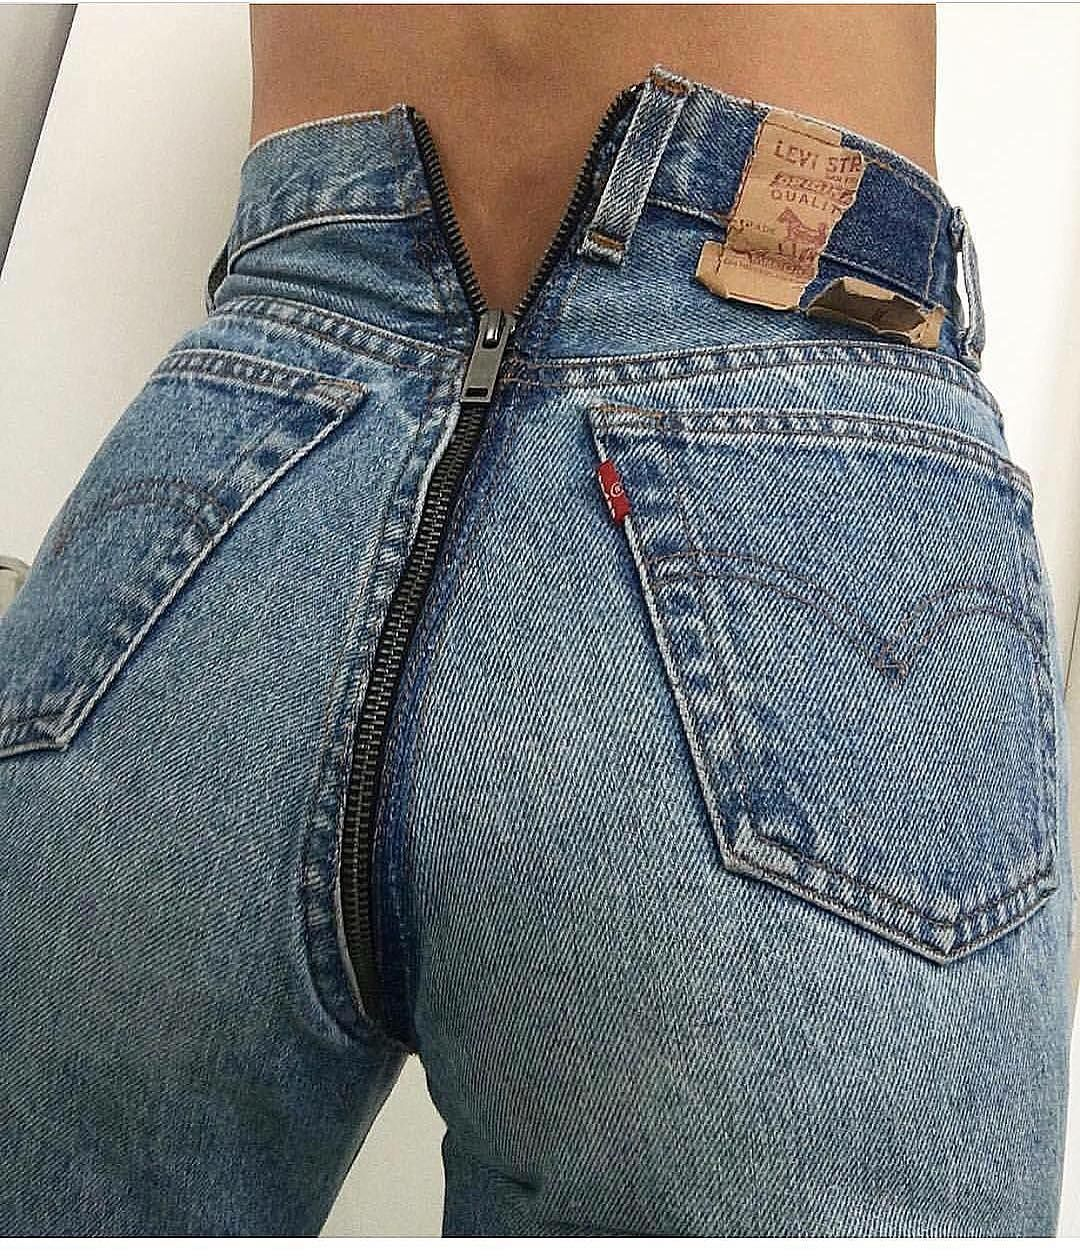 Image result for levi vetement jeans